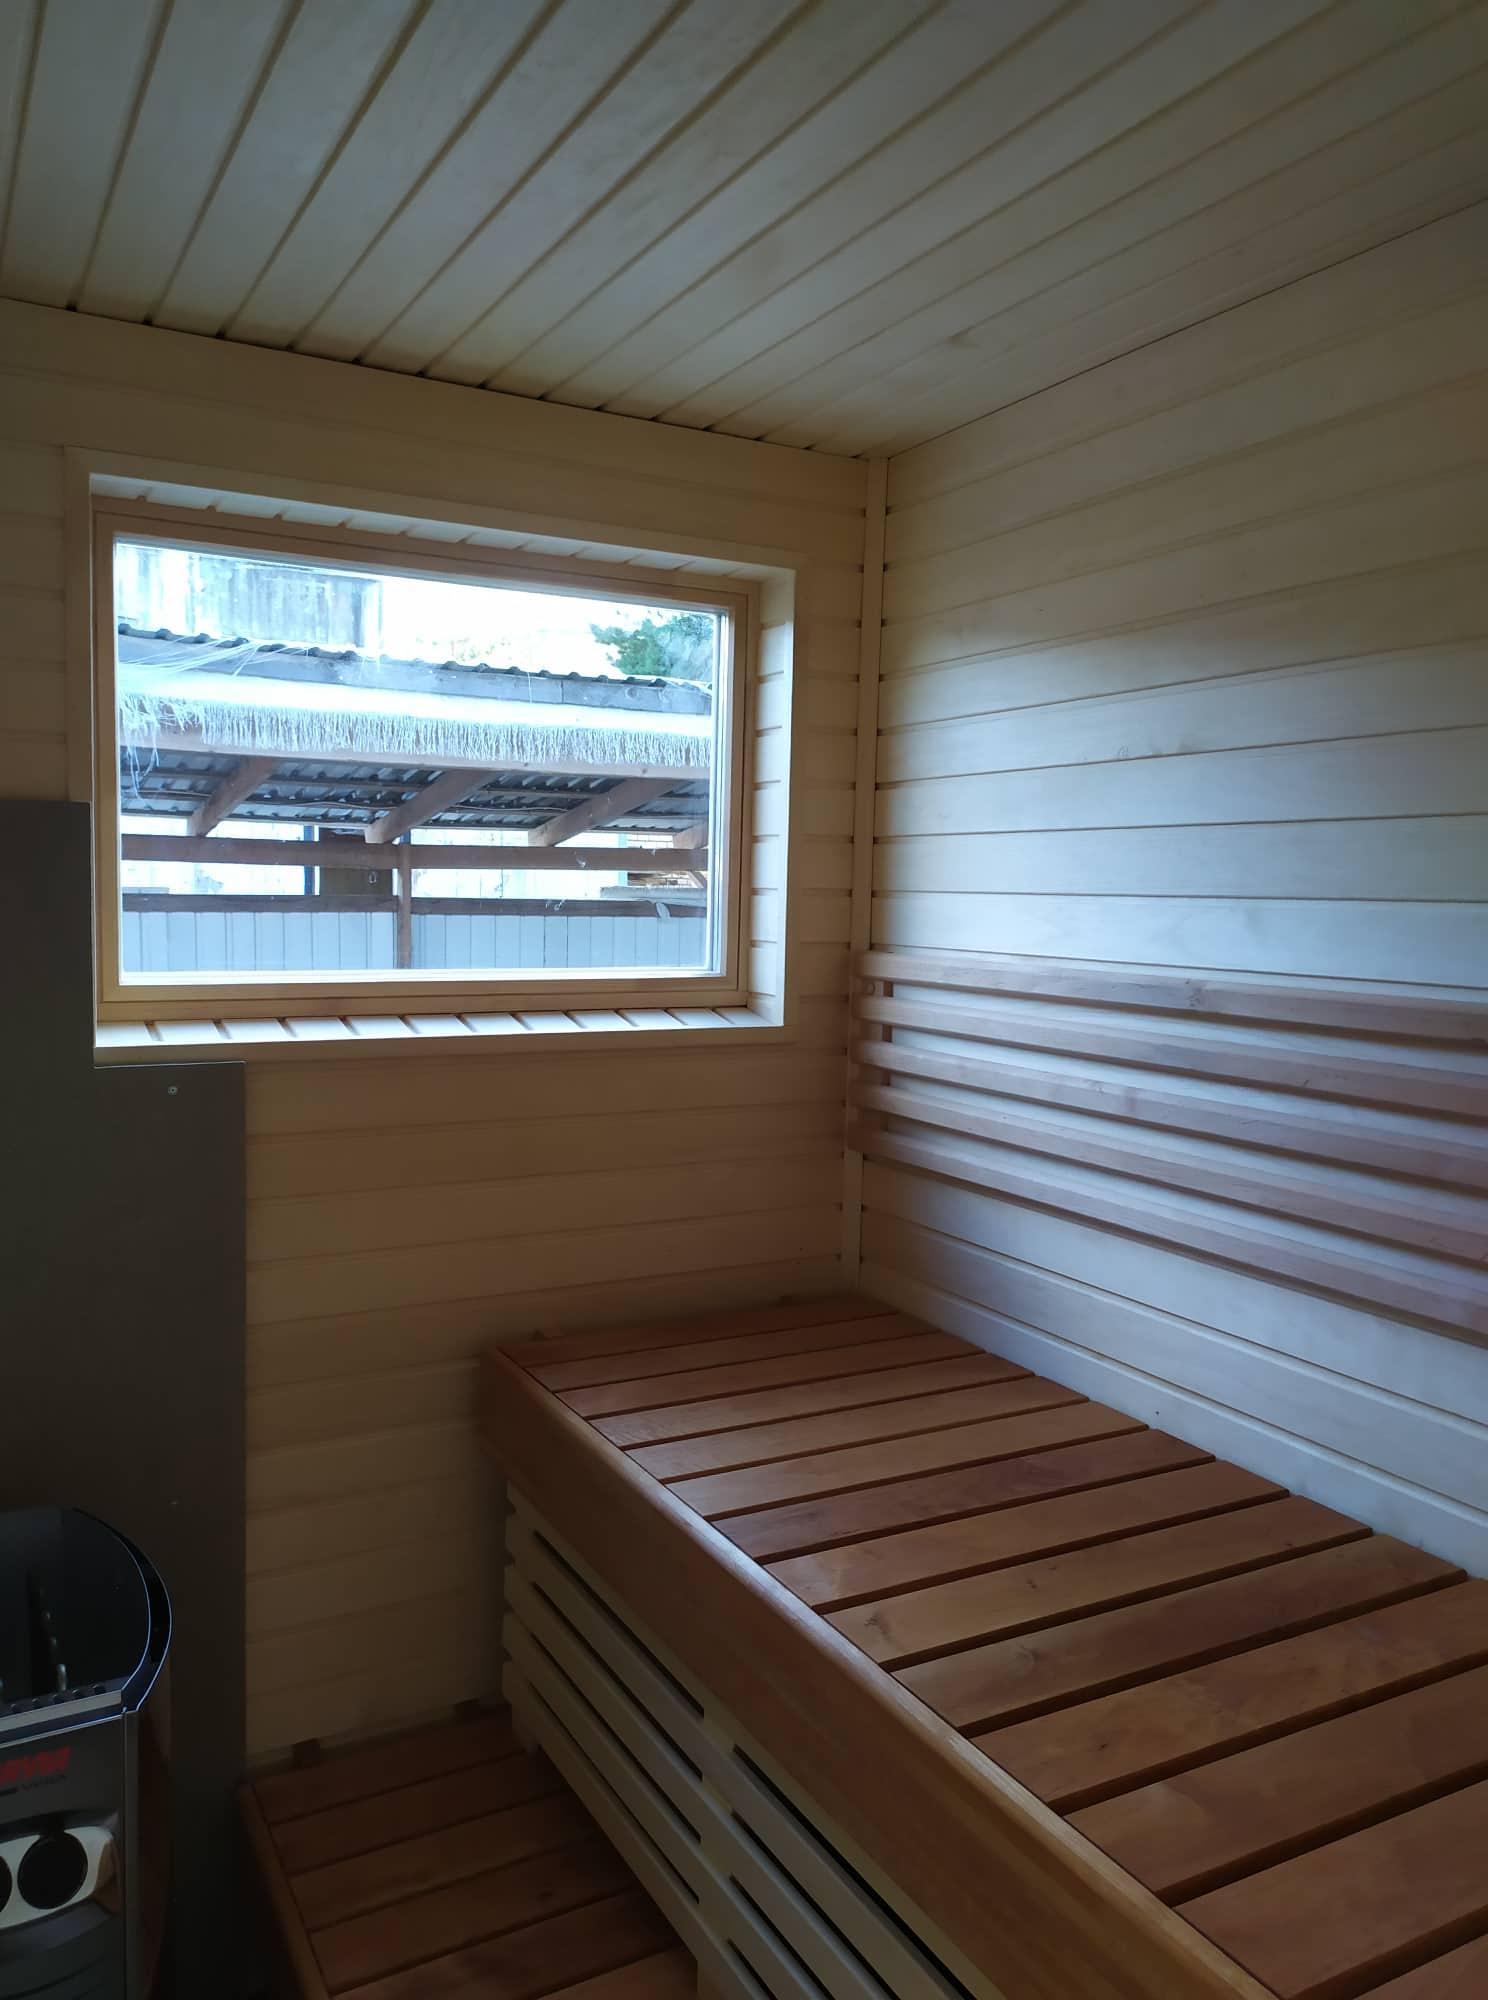 Talovaunu-sauna-talotehdas-ratastelkodu-25082019-kesä-kuljetus-Suomeen.jpg WWW.RATASTELKODU, WWW.TALOTEHDAS.EU